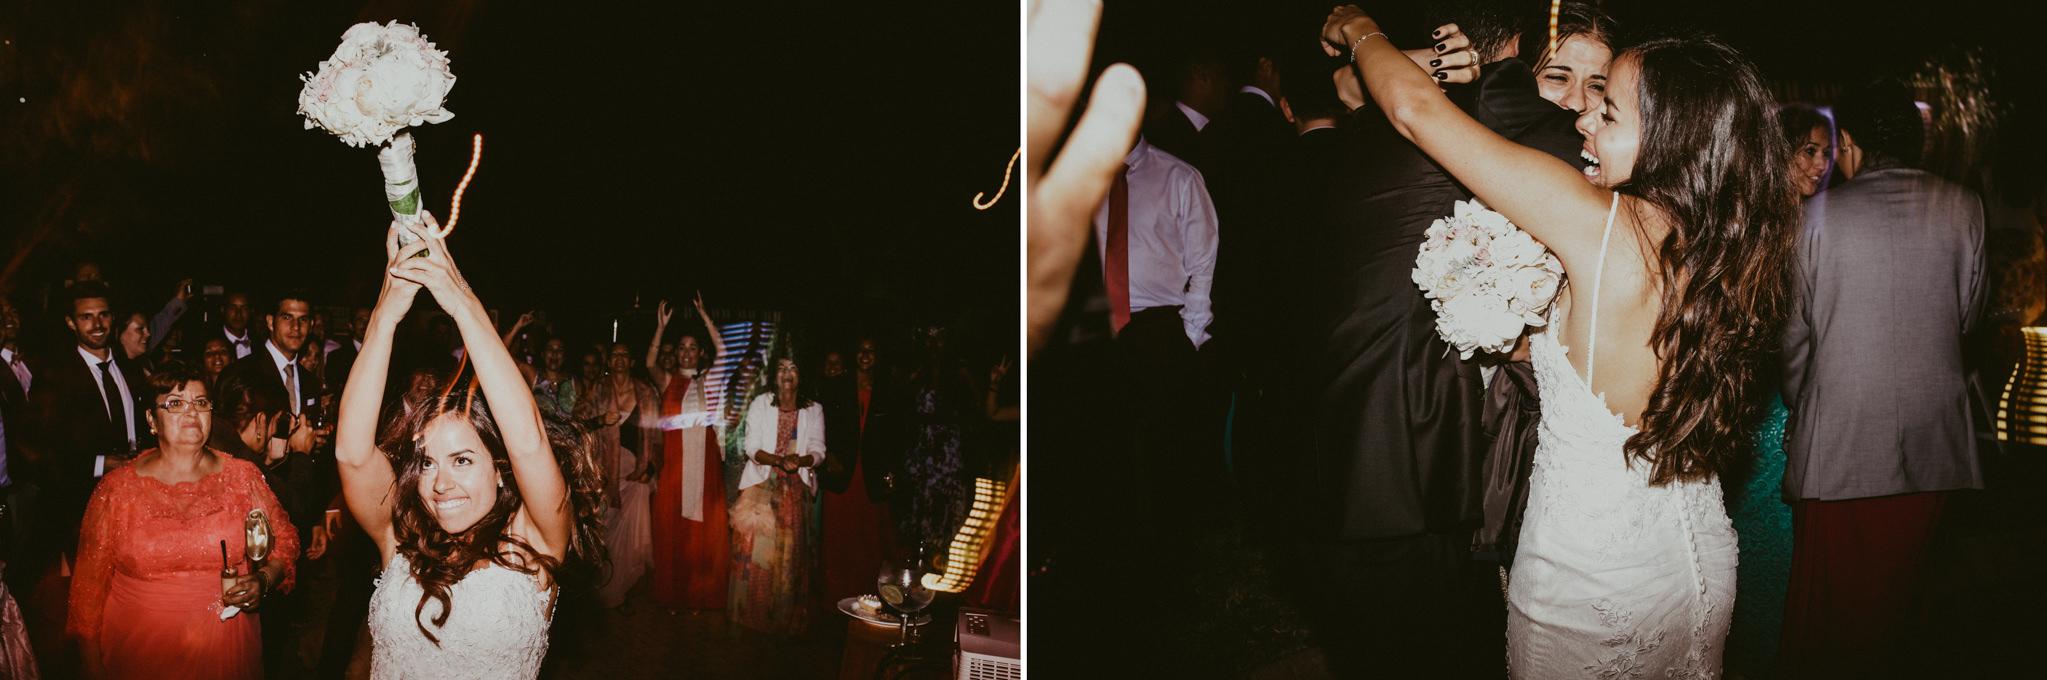 Jessica+Oscar-wedding-132